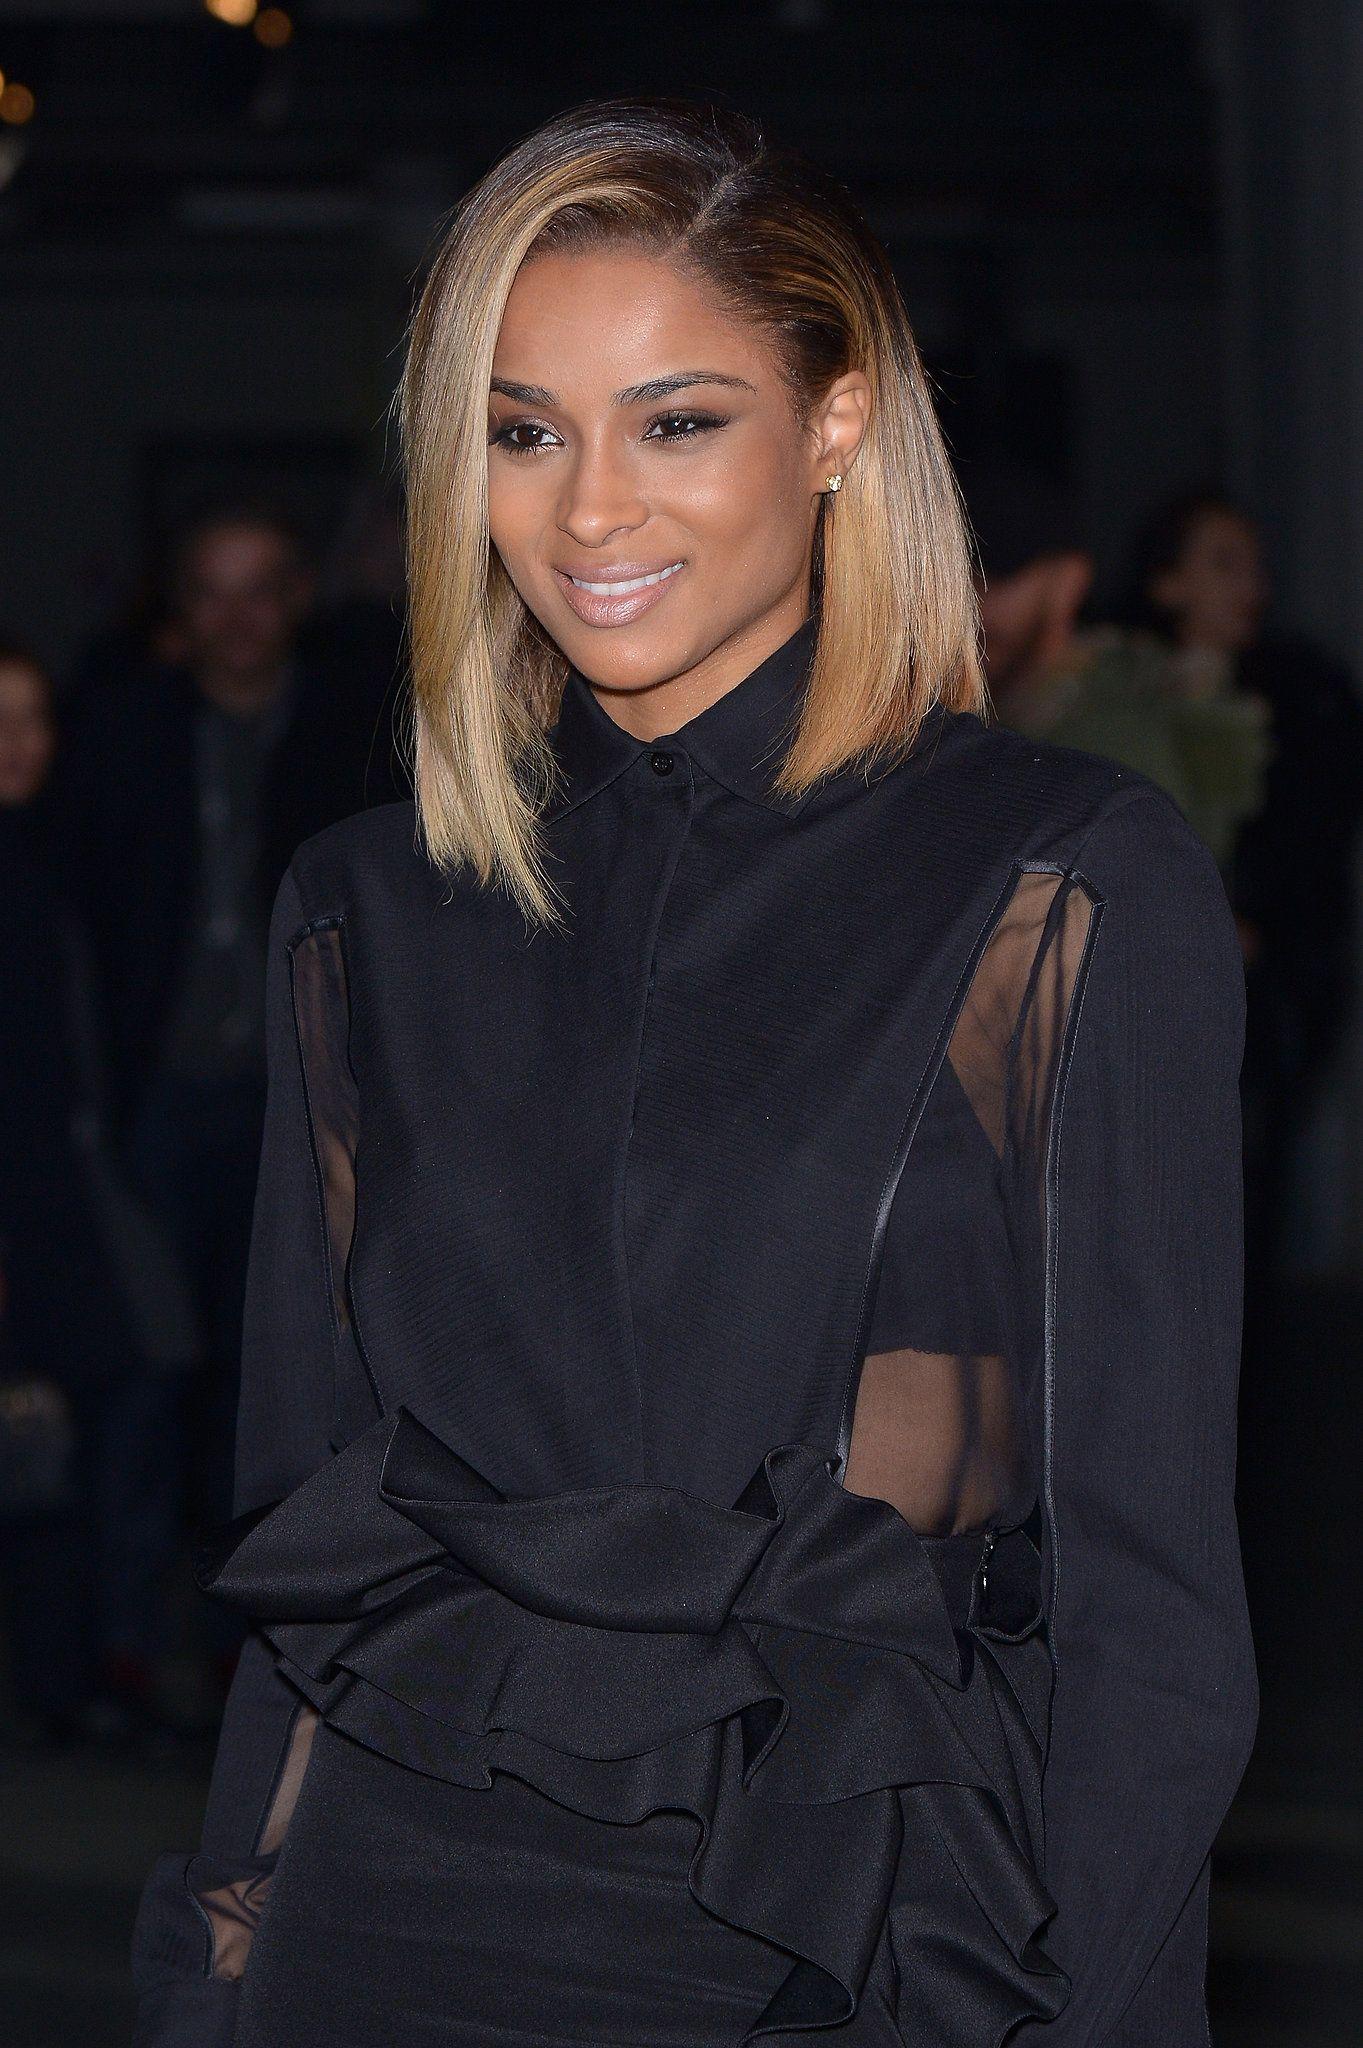 Ciara dark roots blond and haircut styles